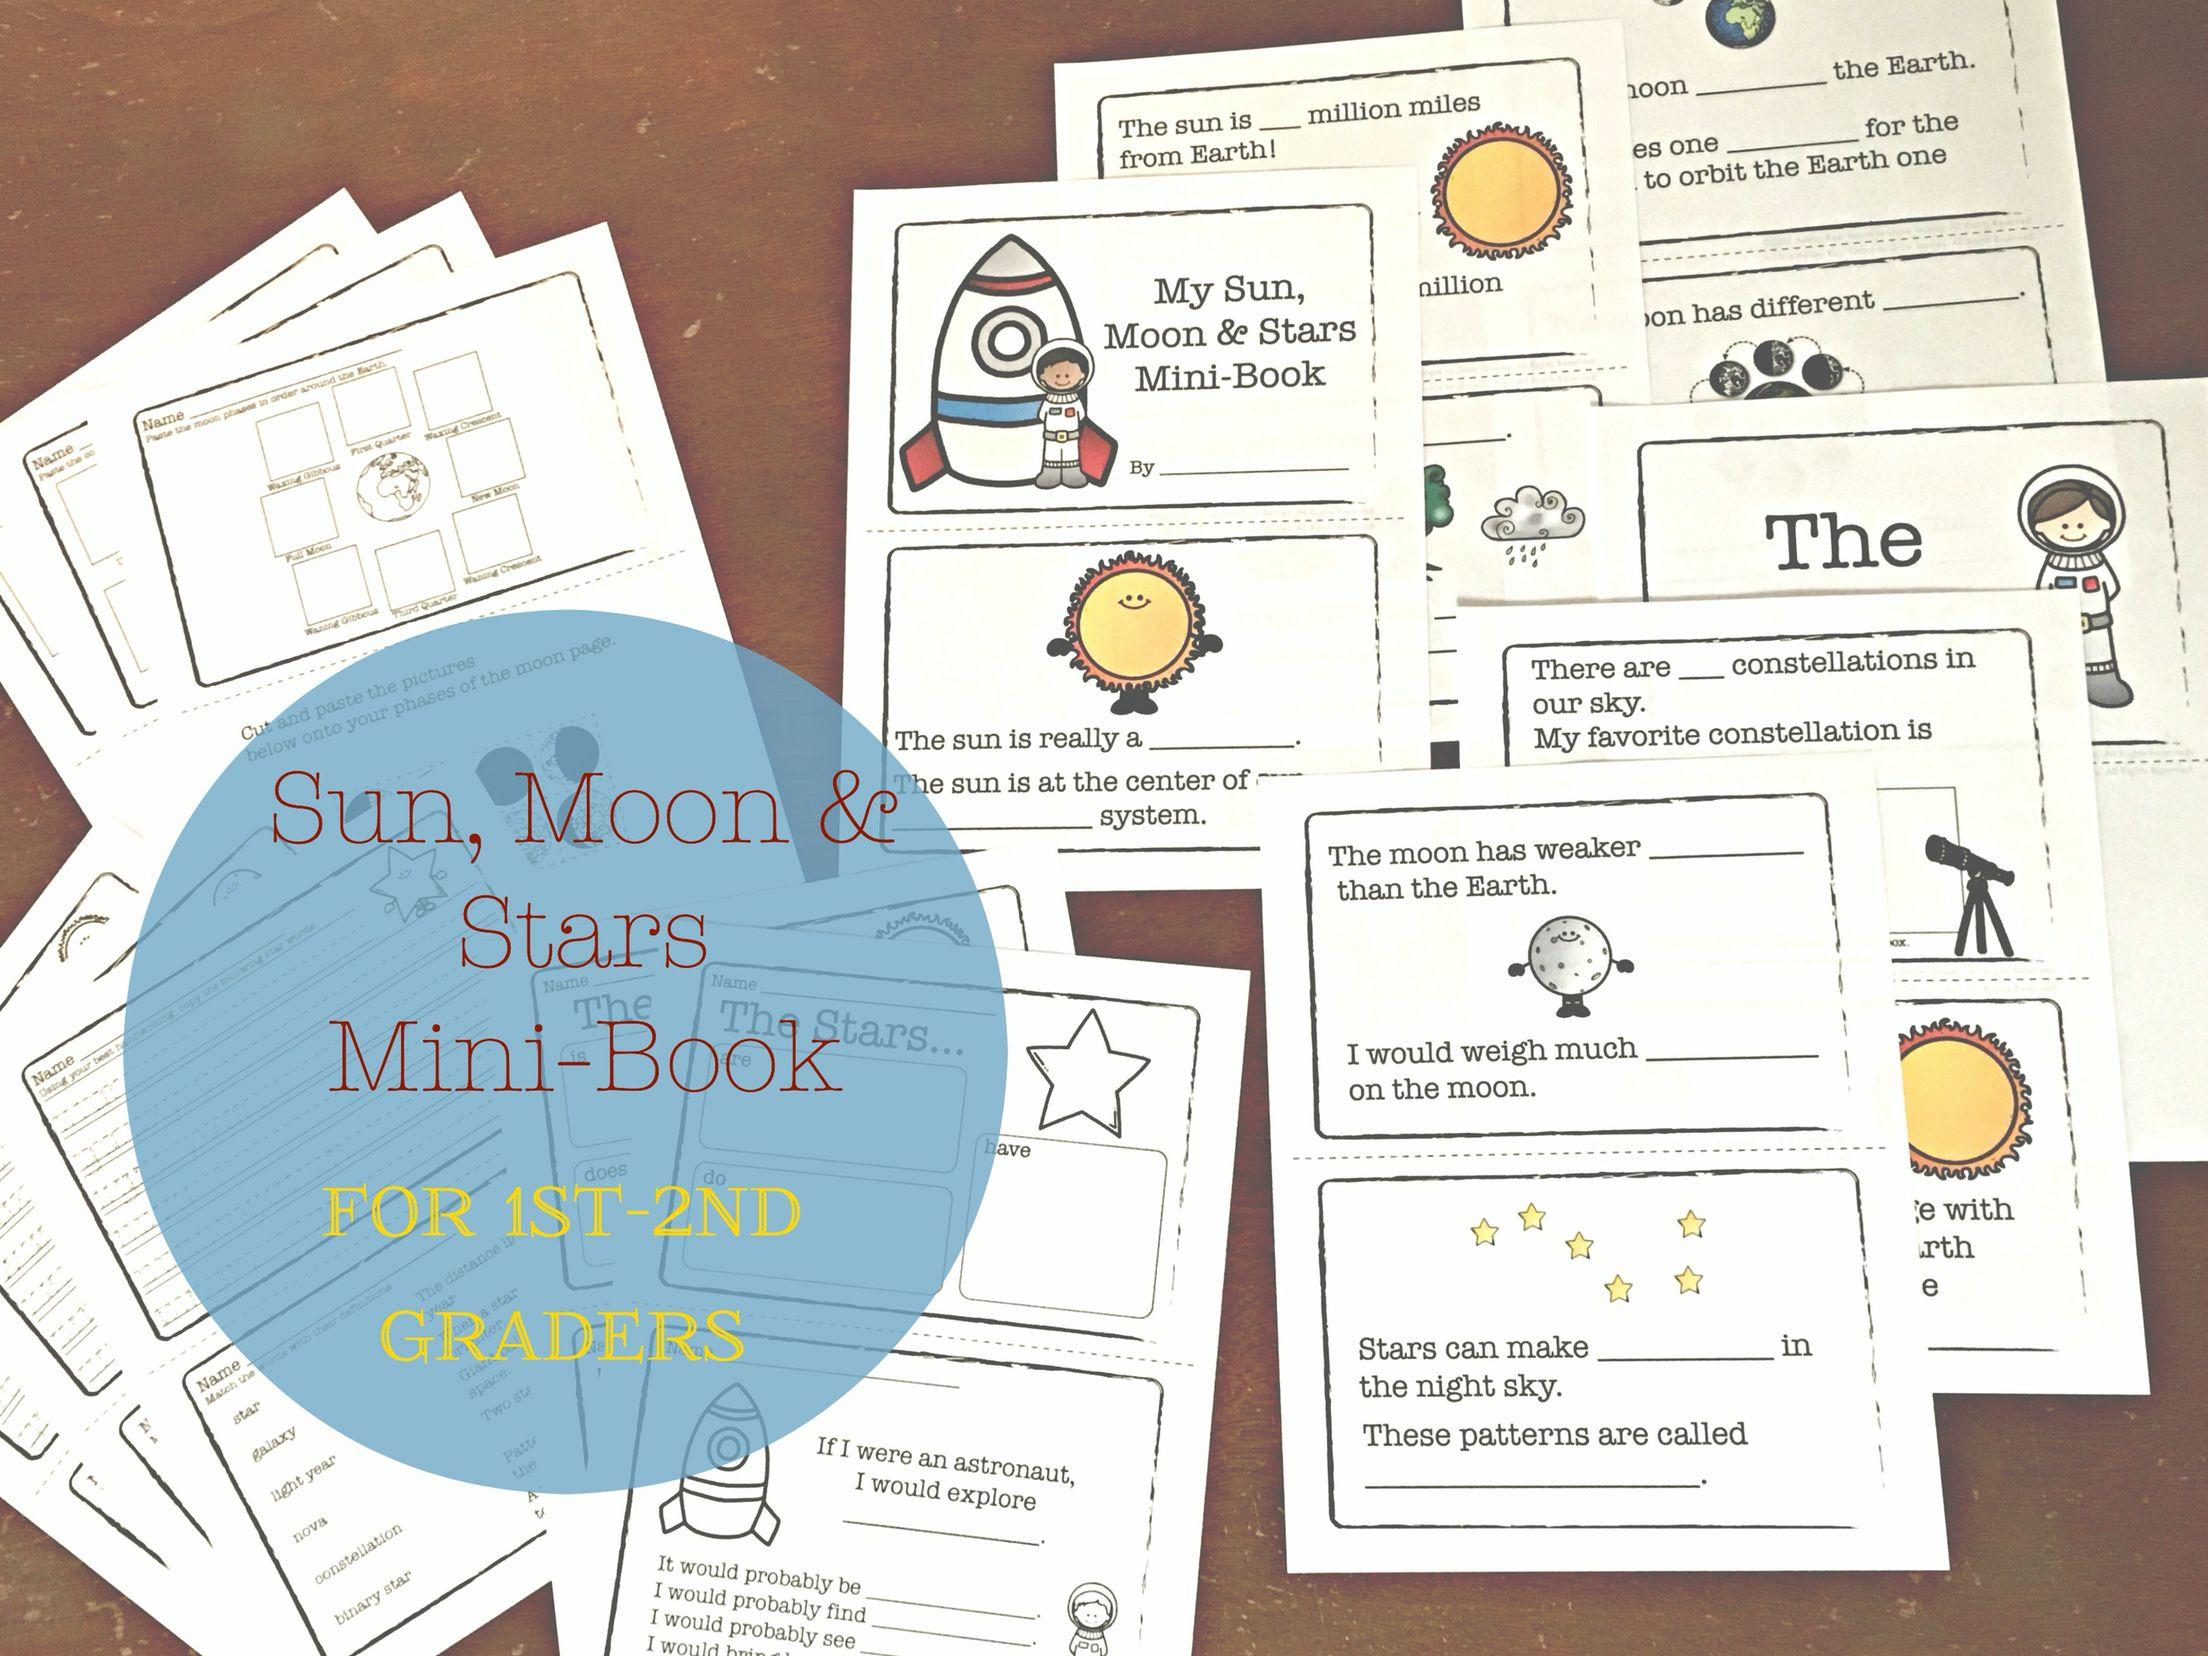 Sun Moon And Stars Mini Book And Unit 1st 2nd Grades